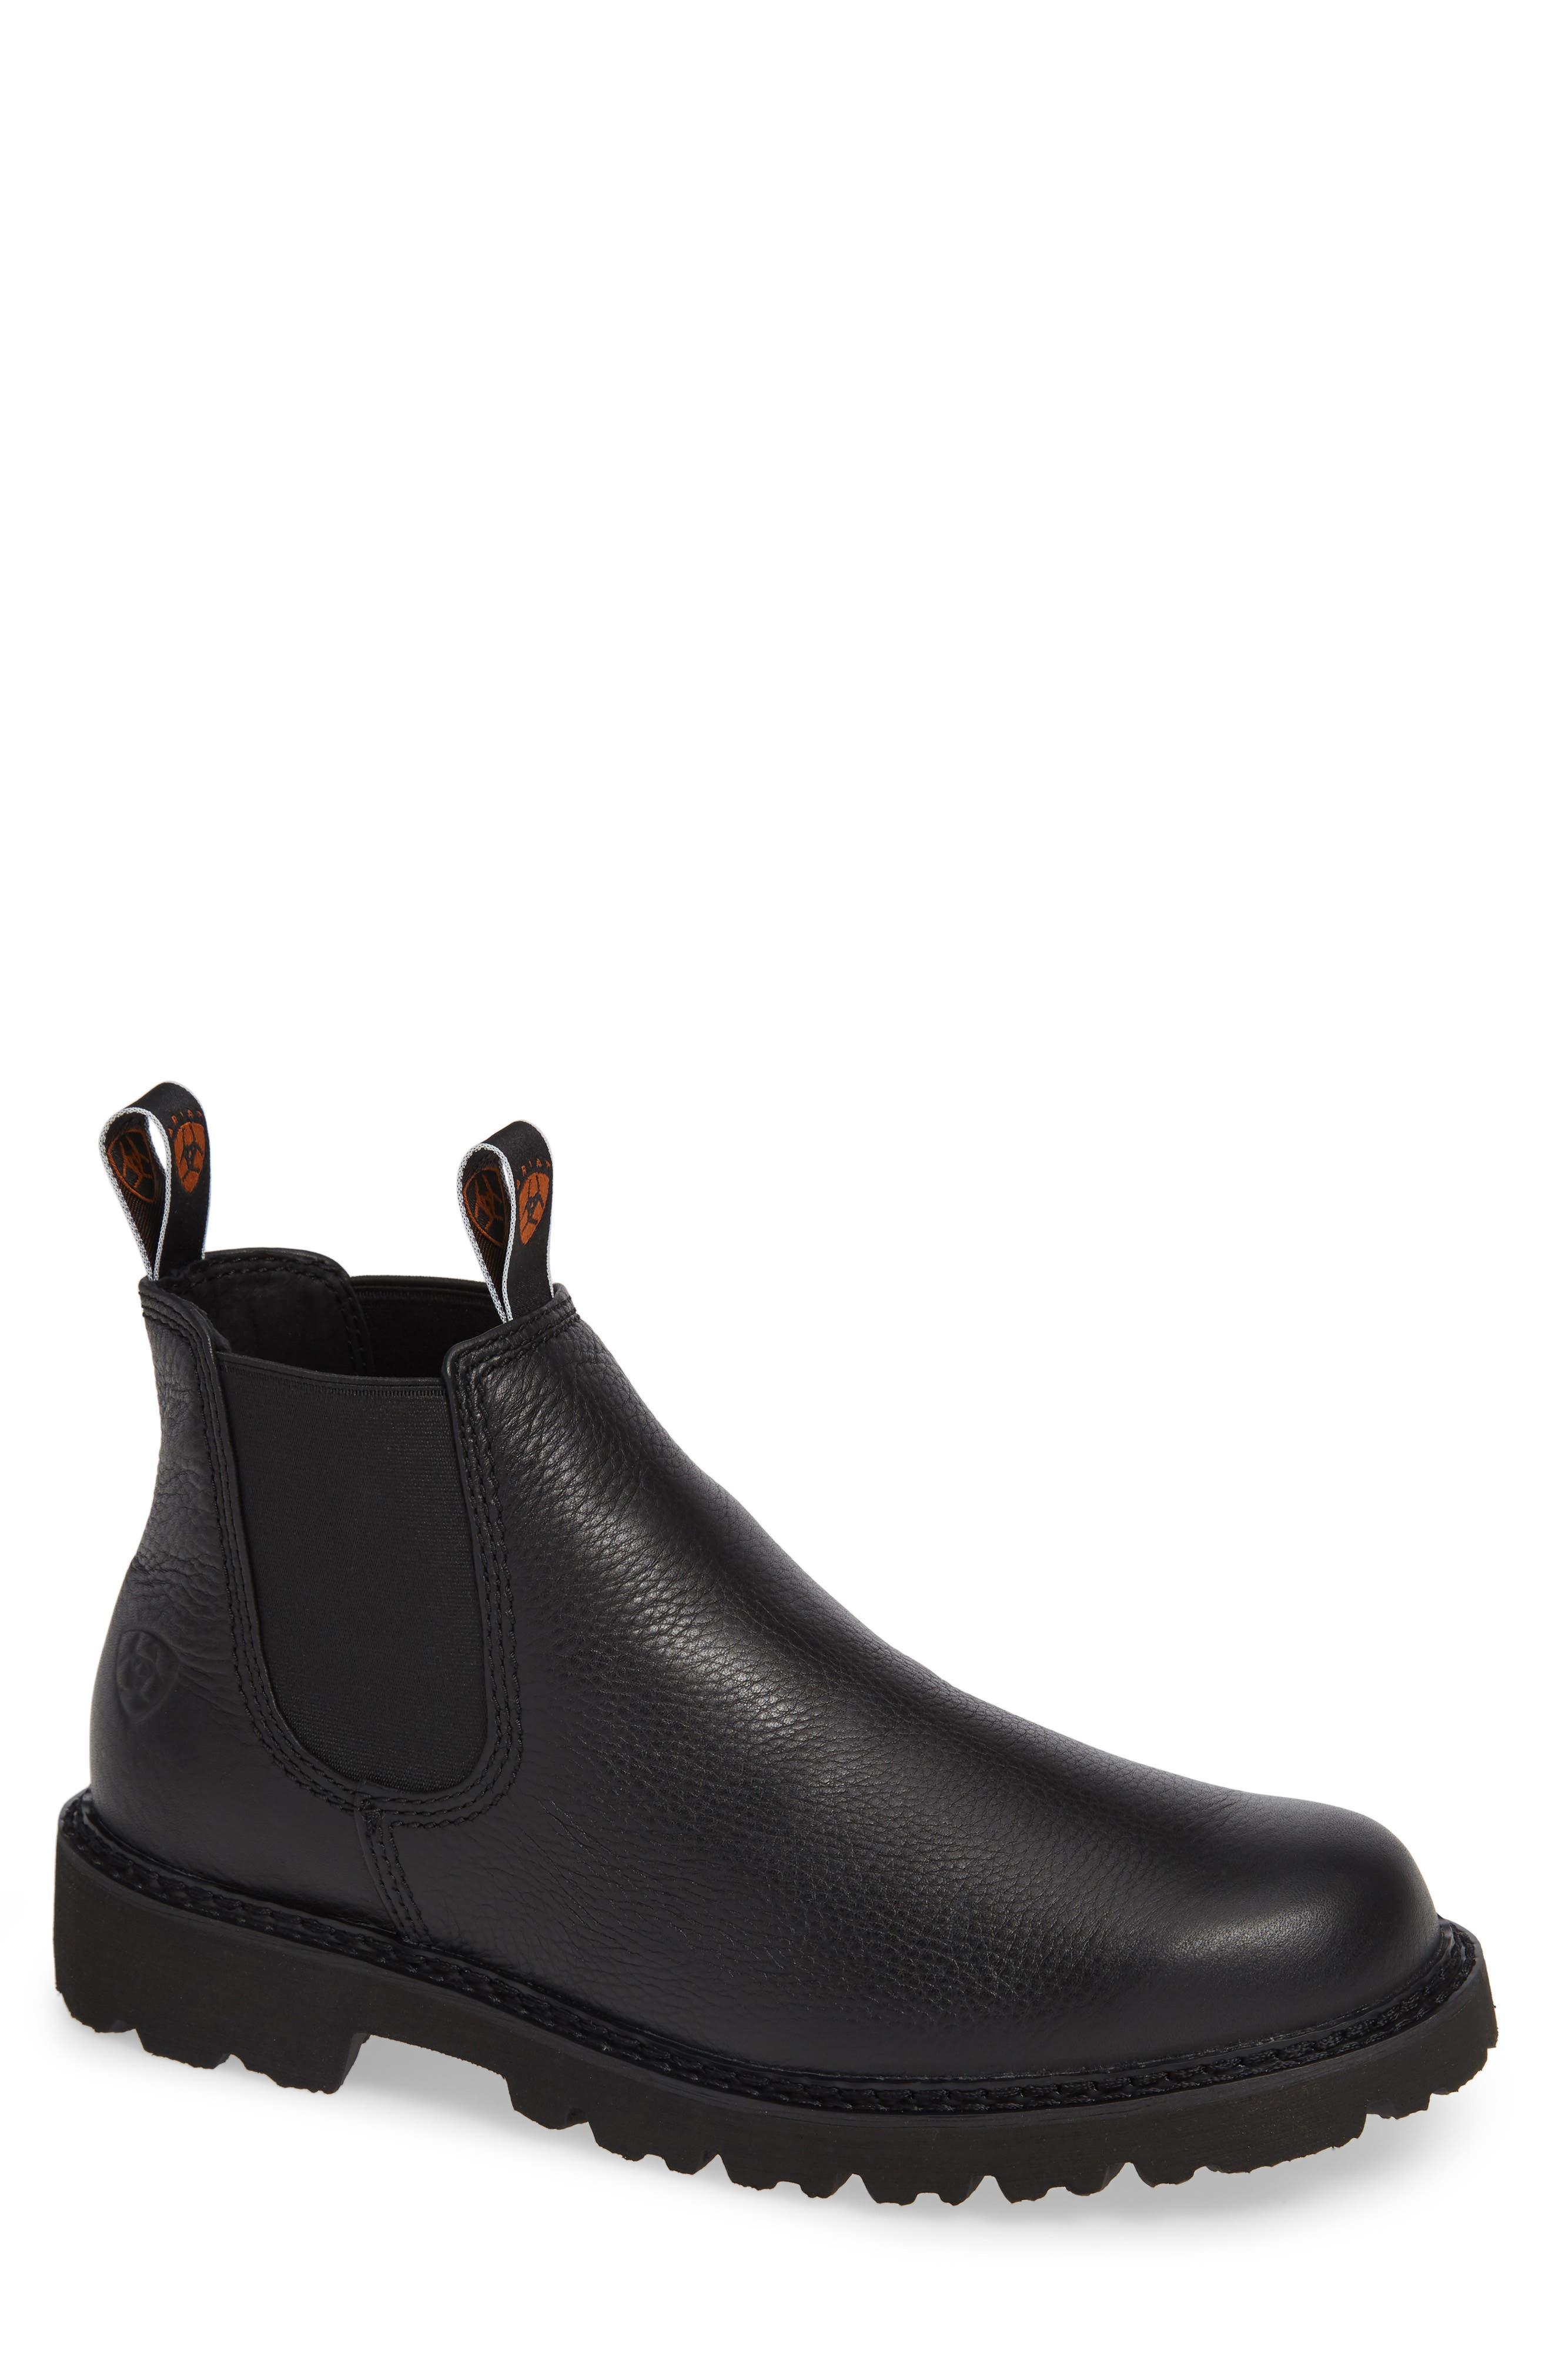 Ariat Spothog Chelsea Boot- Black